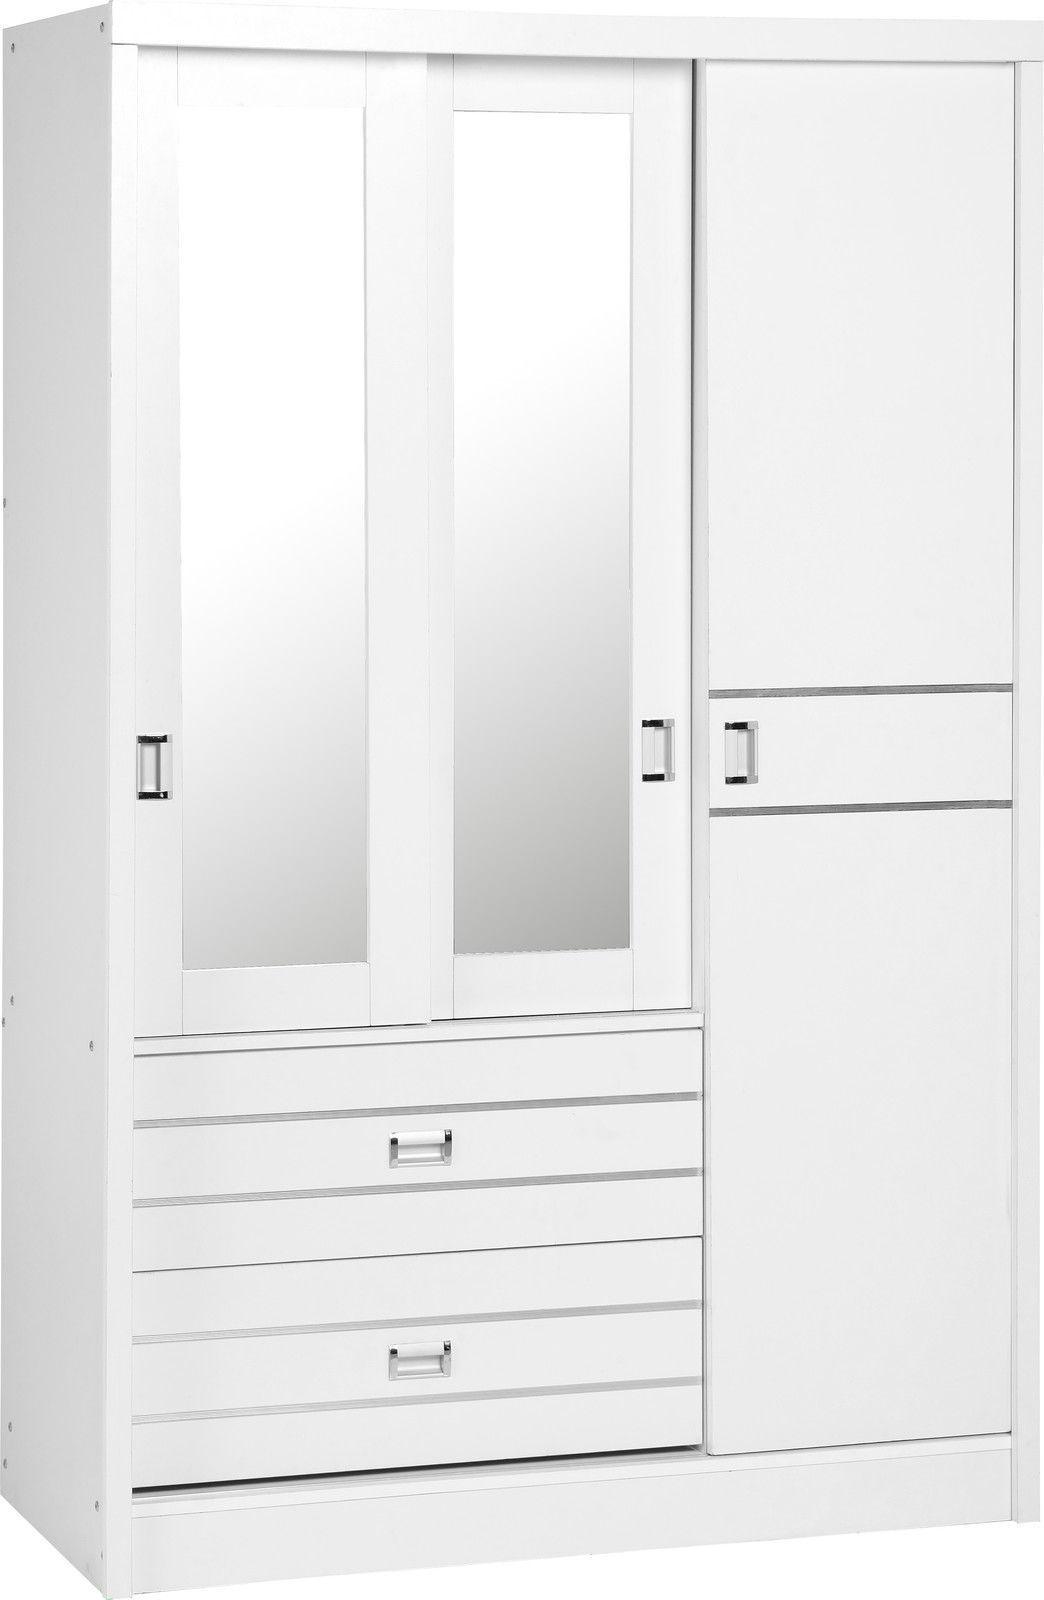 Jordan White Silver 3 Door 2 Drawer Sliding Mirrored